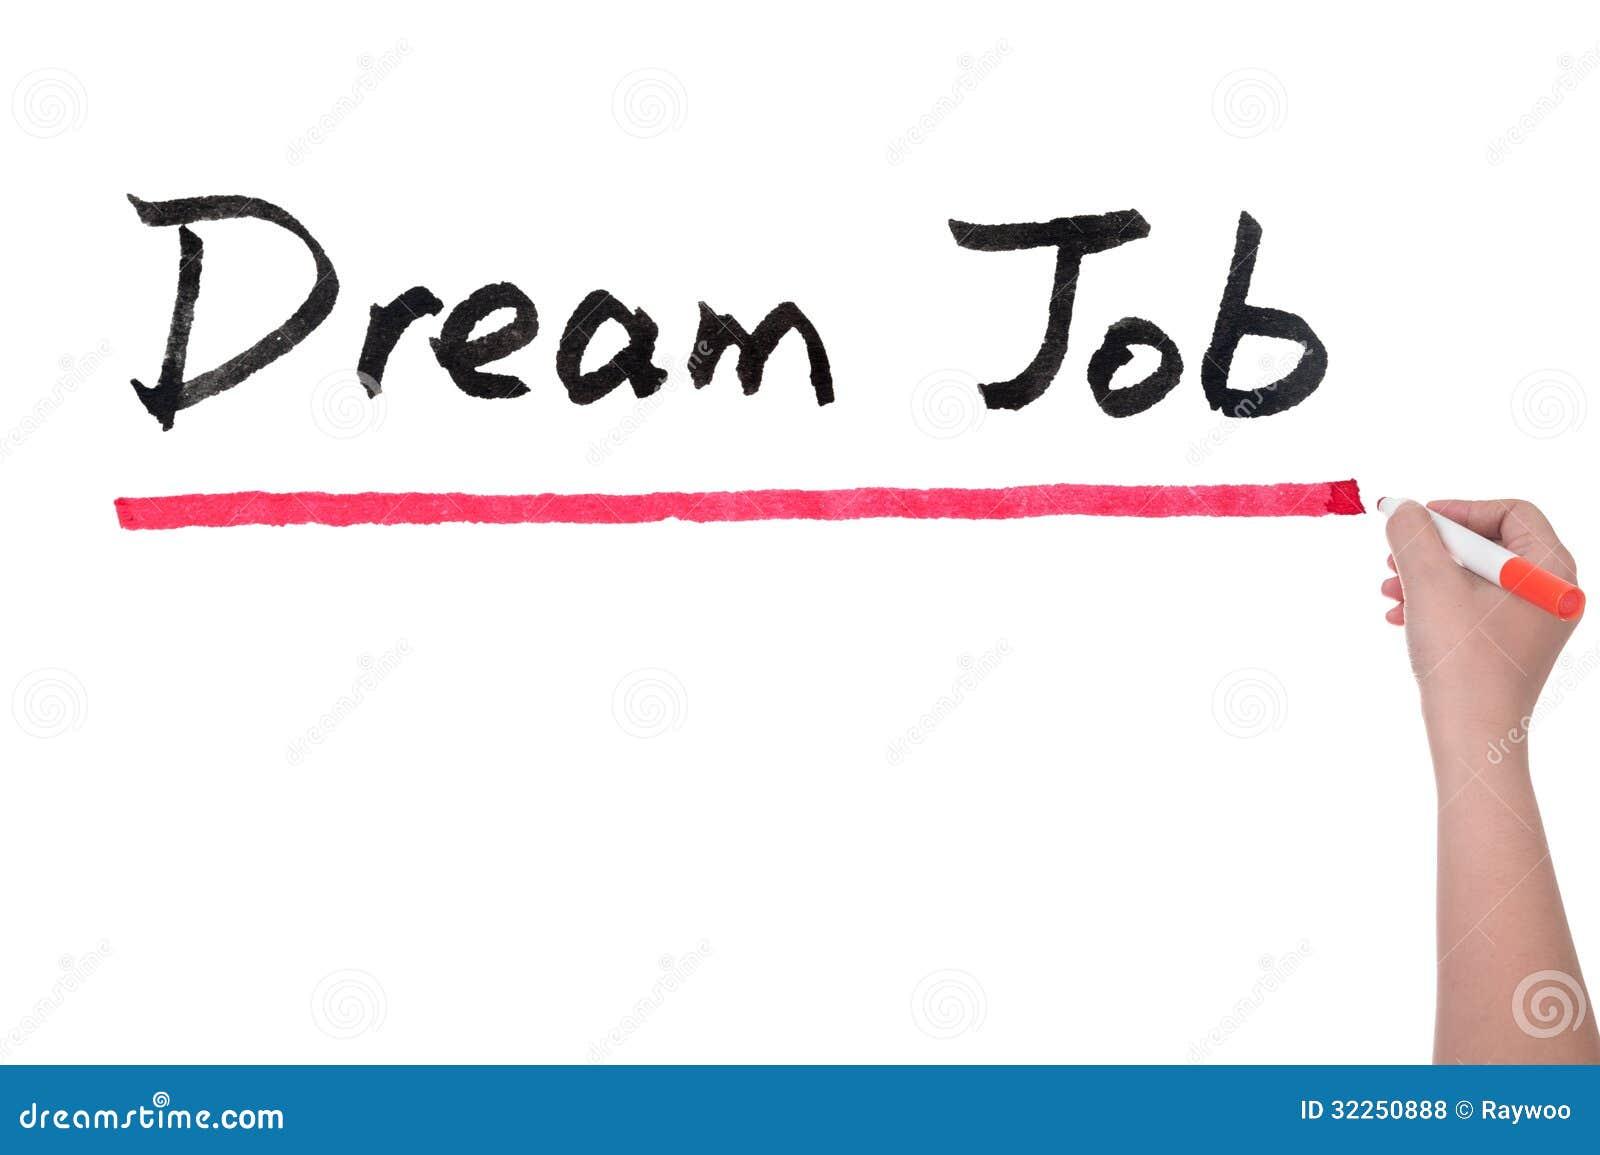 Teenage Problems Essay Dream Job Photographer Essay Things Fall Apart Book Review Essay also Macaulay Honors Essay Dream Job Photographer Essay  Cheeringkeepingga Embarrassing Moments Essay